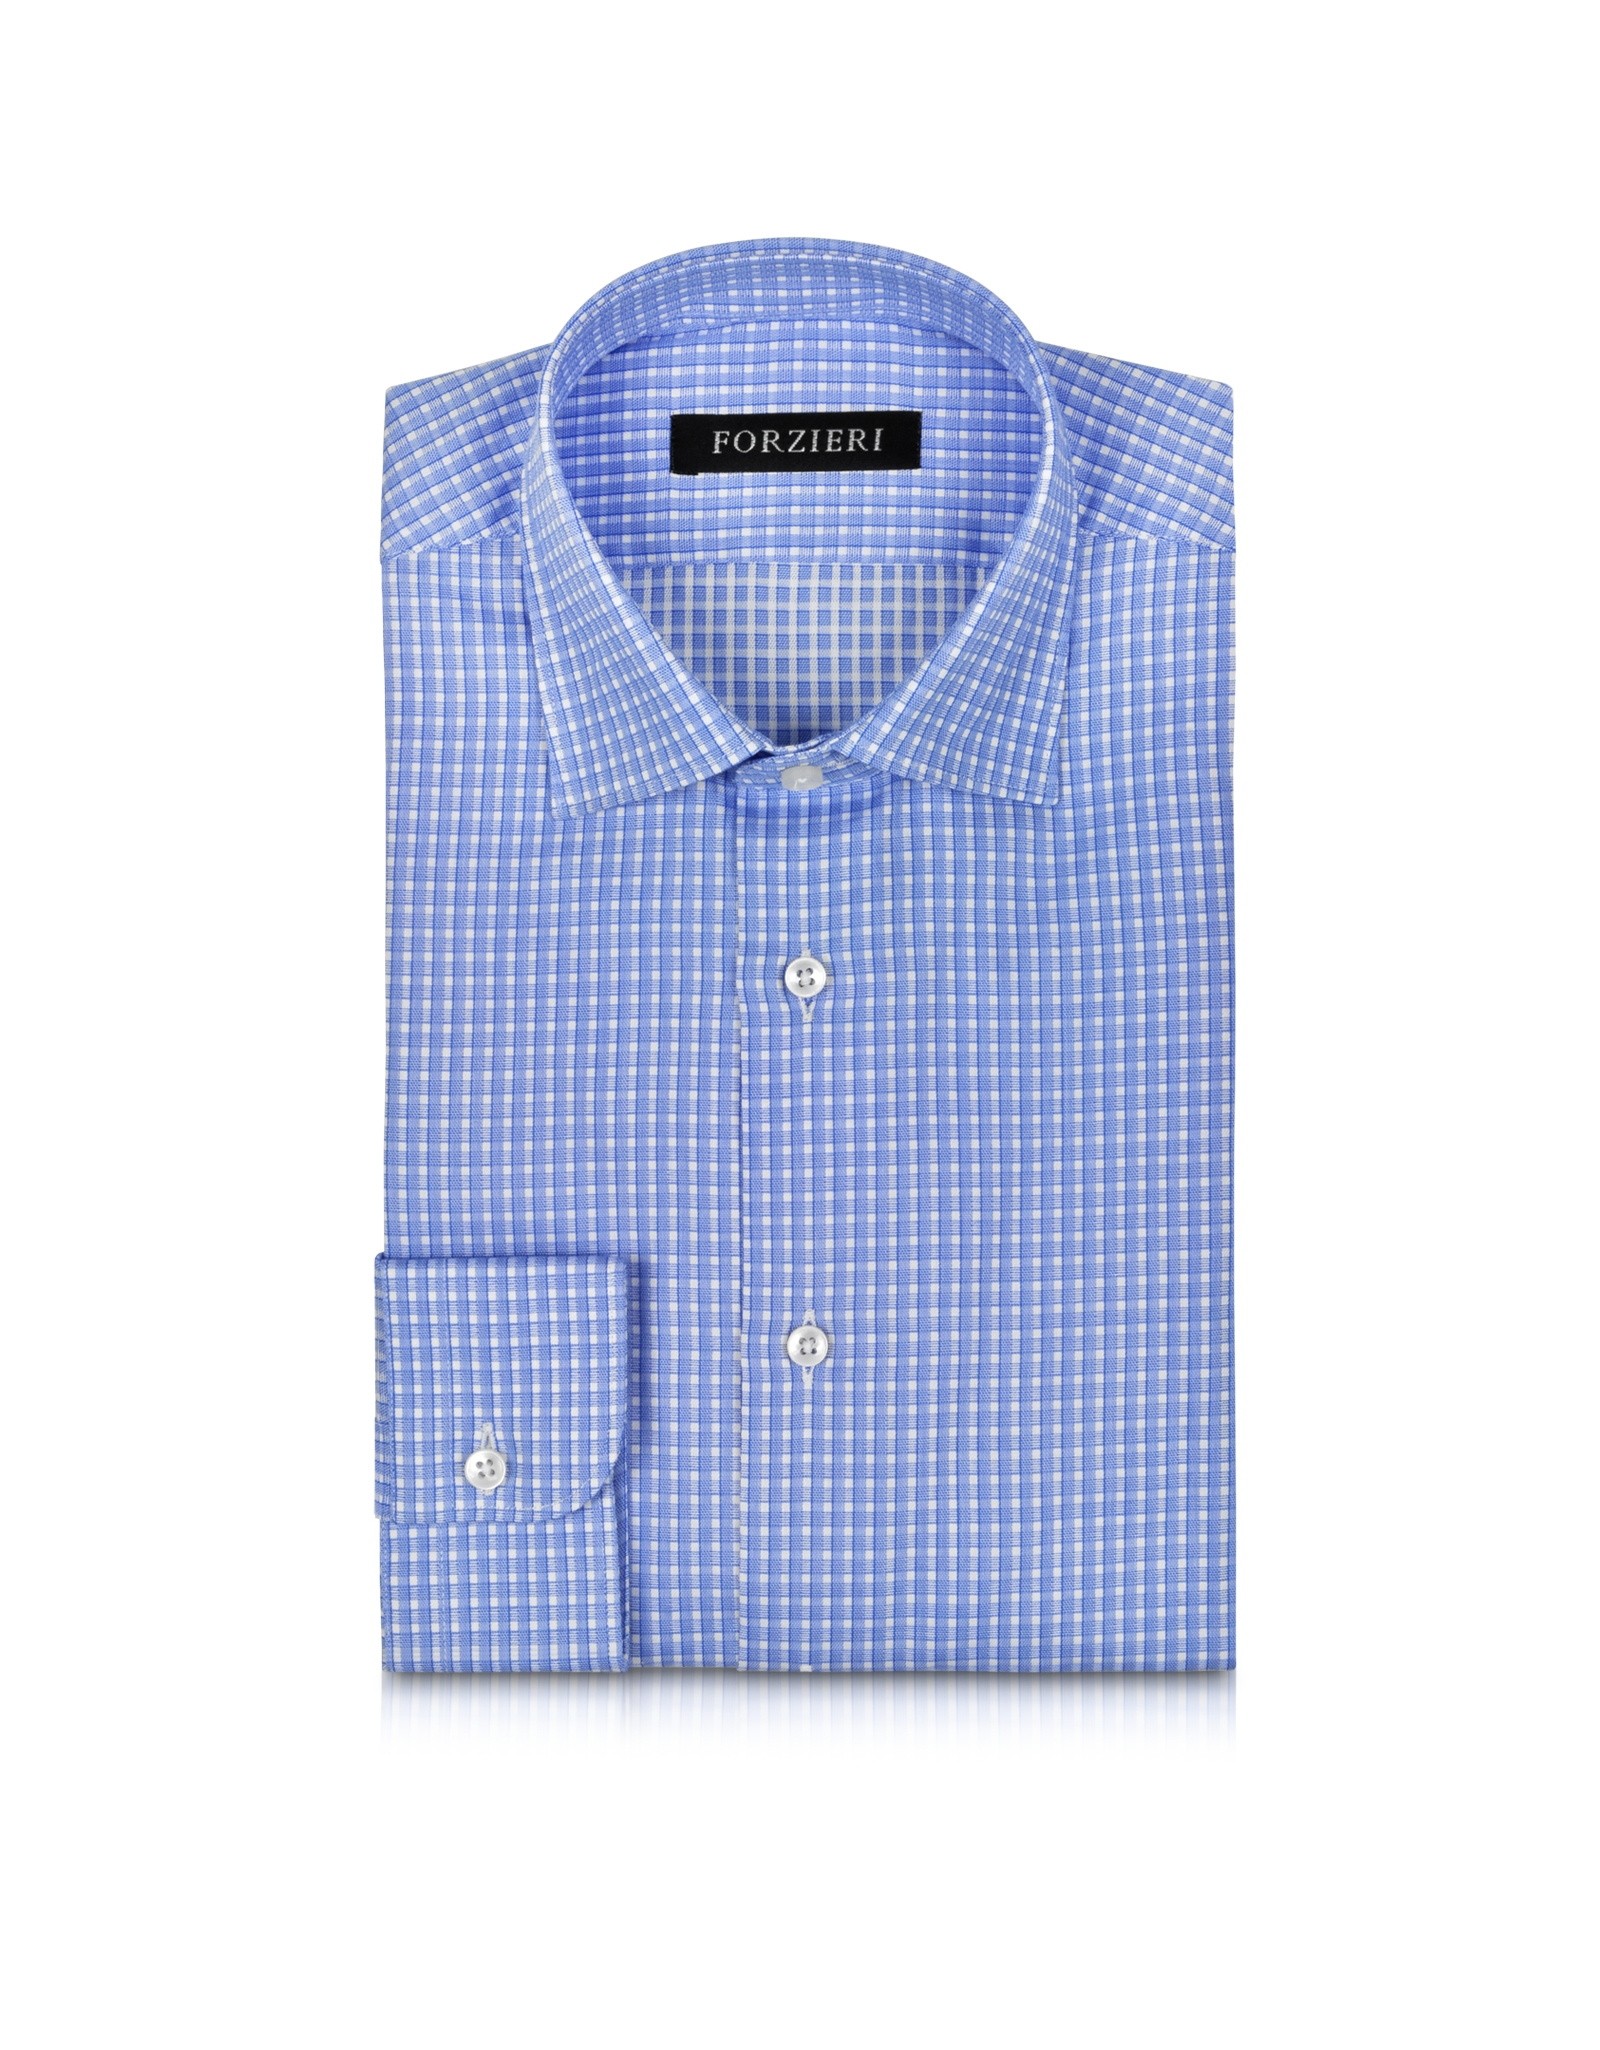 Forzieri Light Blue Checked Non Iron Cotton Slim Fit Men's ...